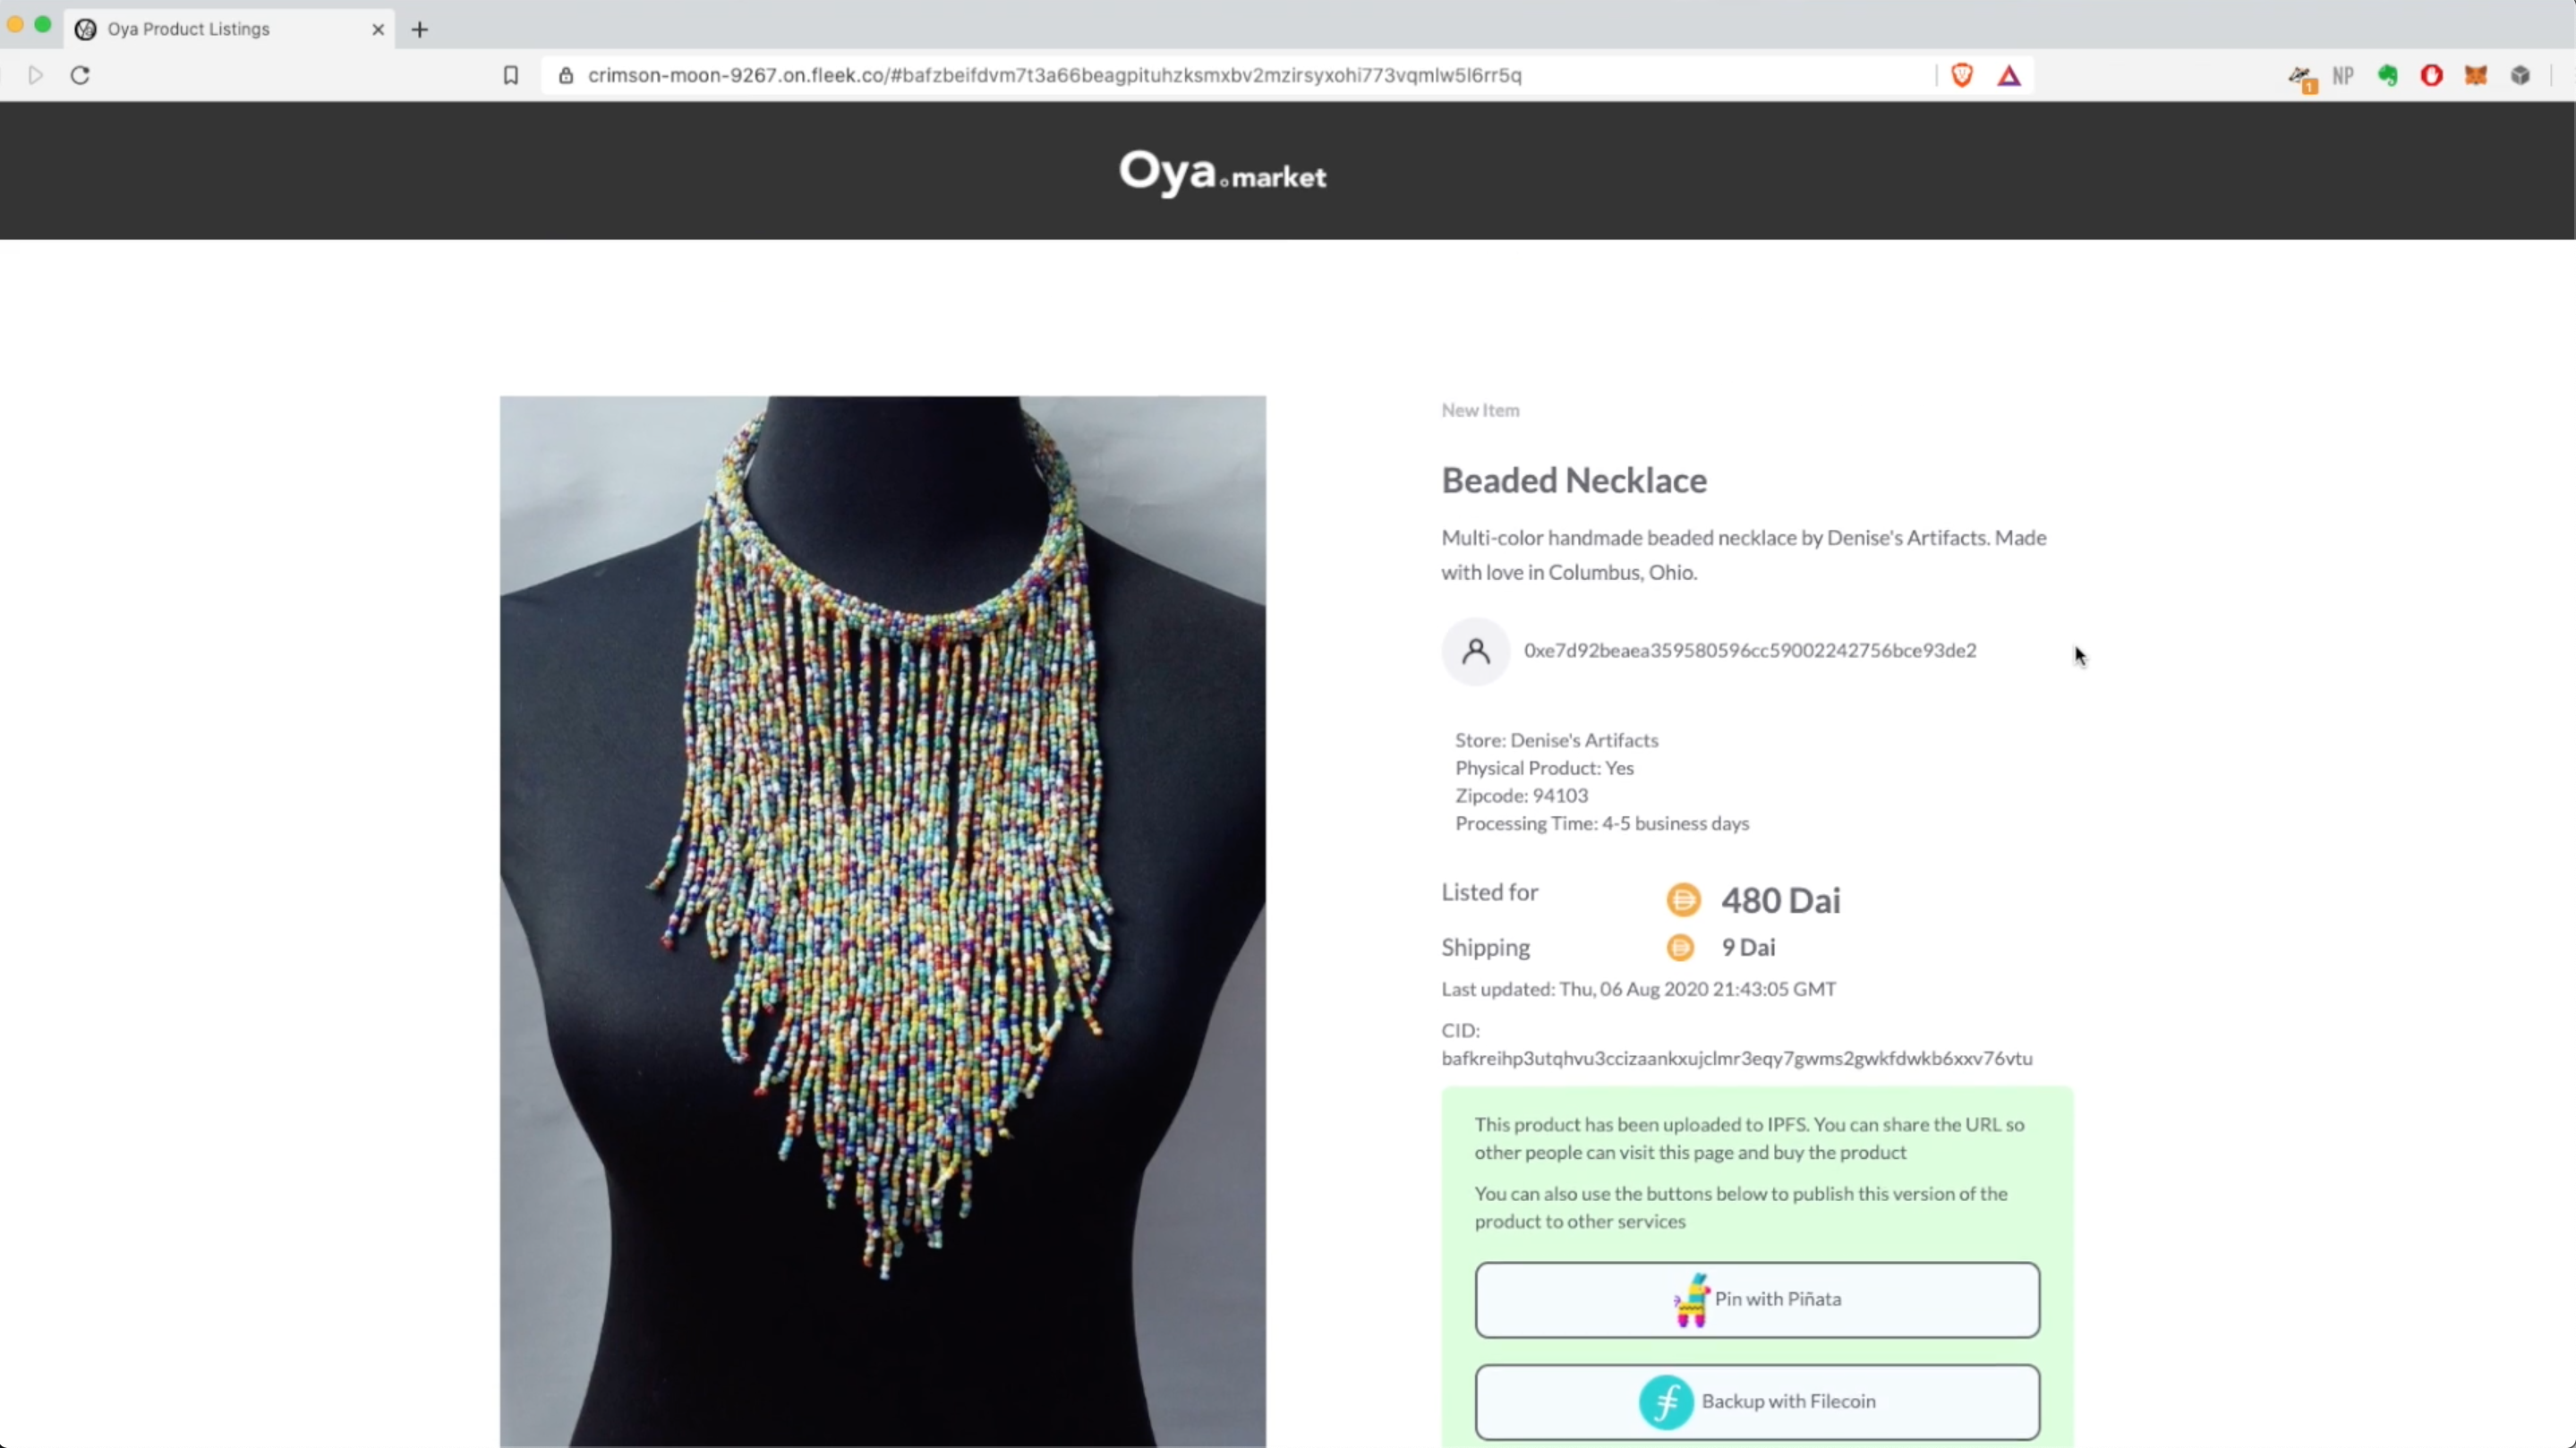 https://ethglobal.s3.amazonaws.com/recDvXC3SjNuibhTi/Oya_Product_Listing_Screenshot.png